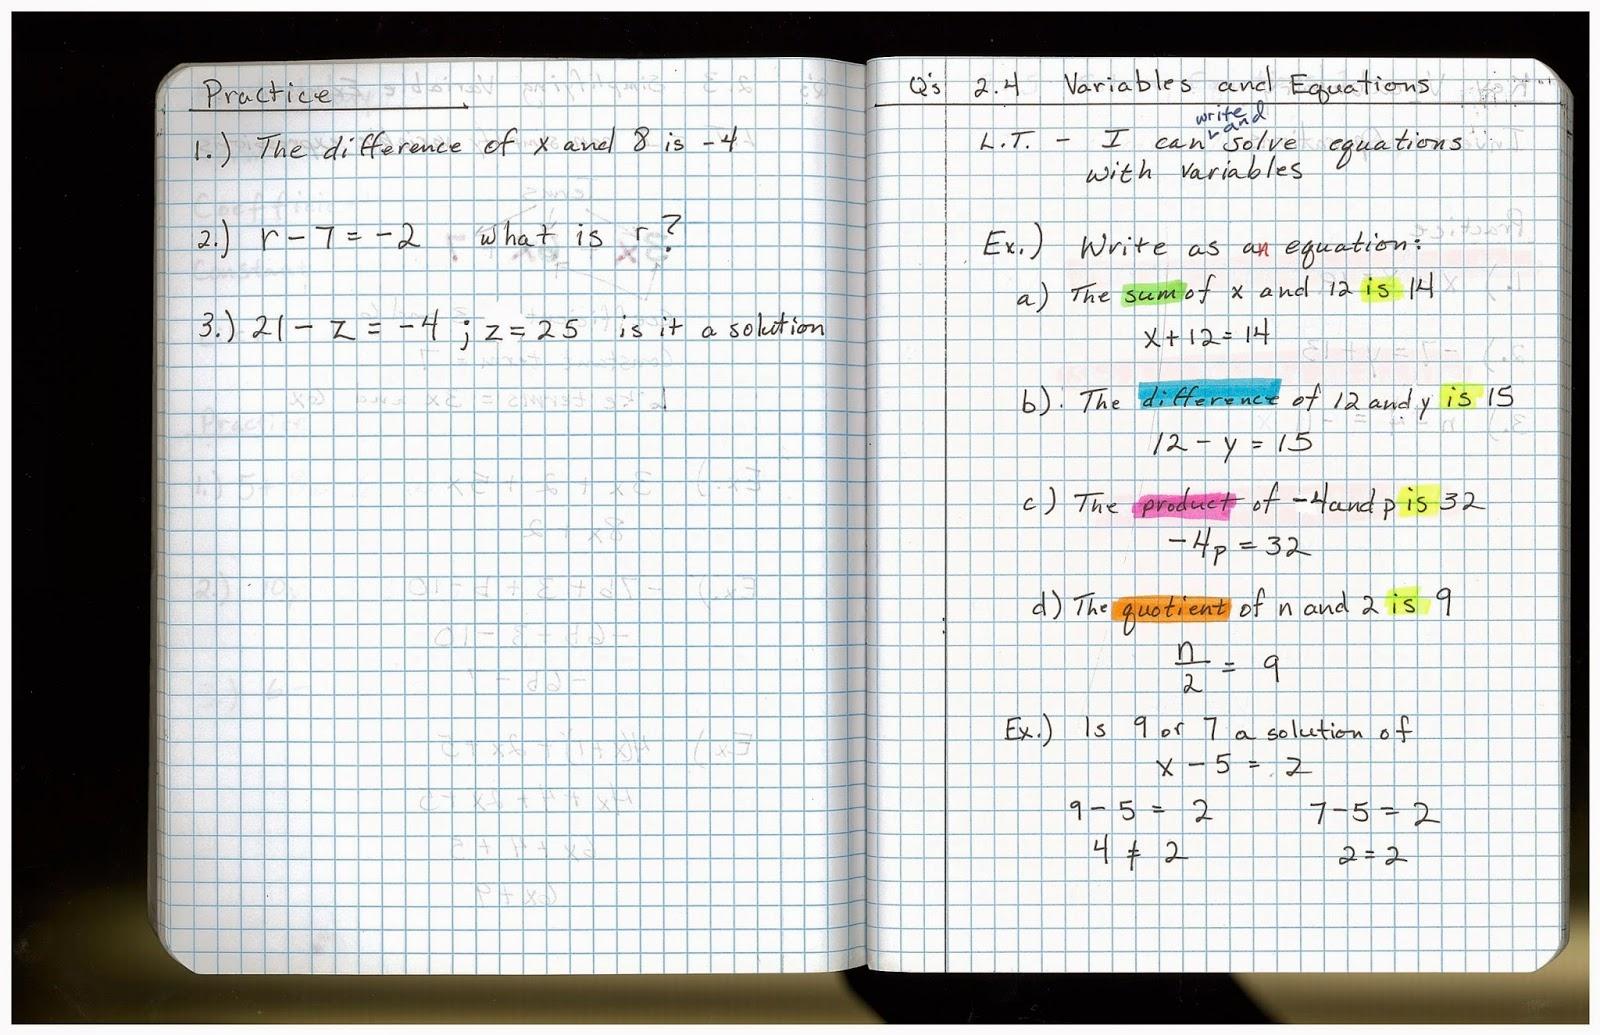 medium resolution of Heidemann 8th Grade Math: 5th Period Pre Algebra 10/7